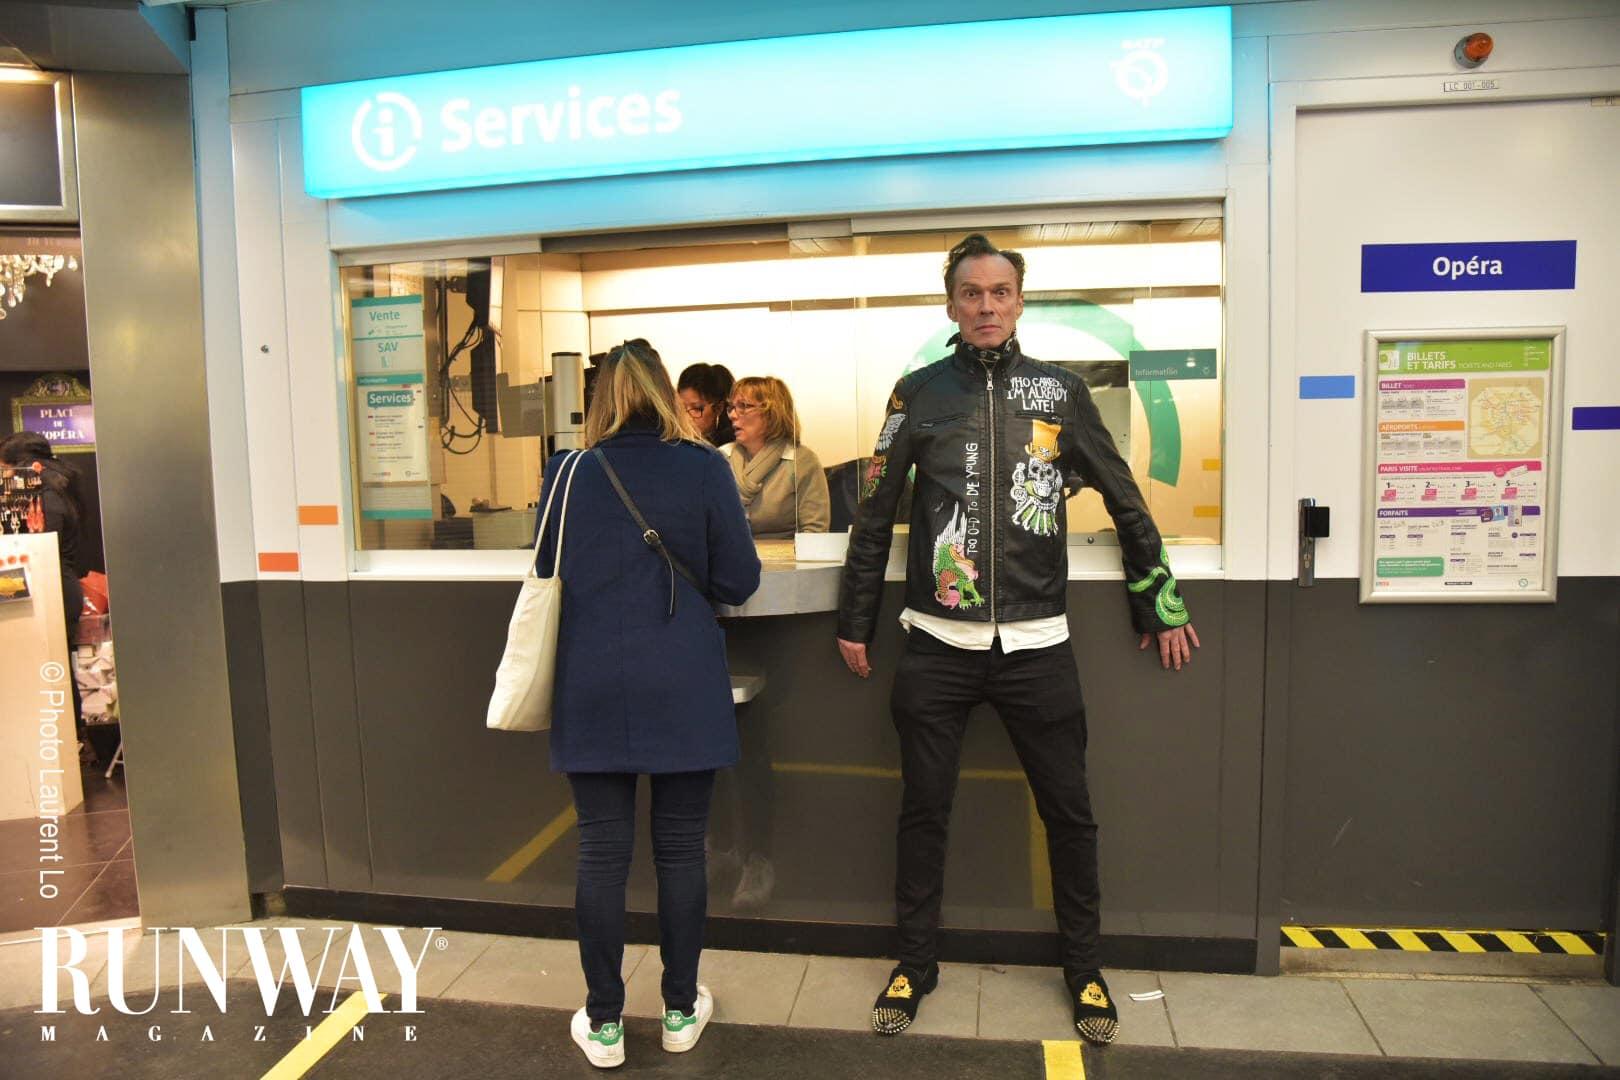 Runway-Magazine-2017-photo-Laurent-Lo-paris-Patrick-Cordier-Rettig-model-fashion-week-metro